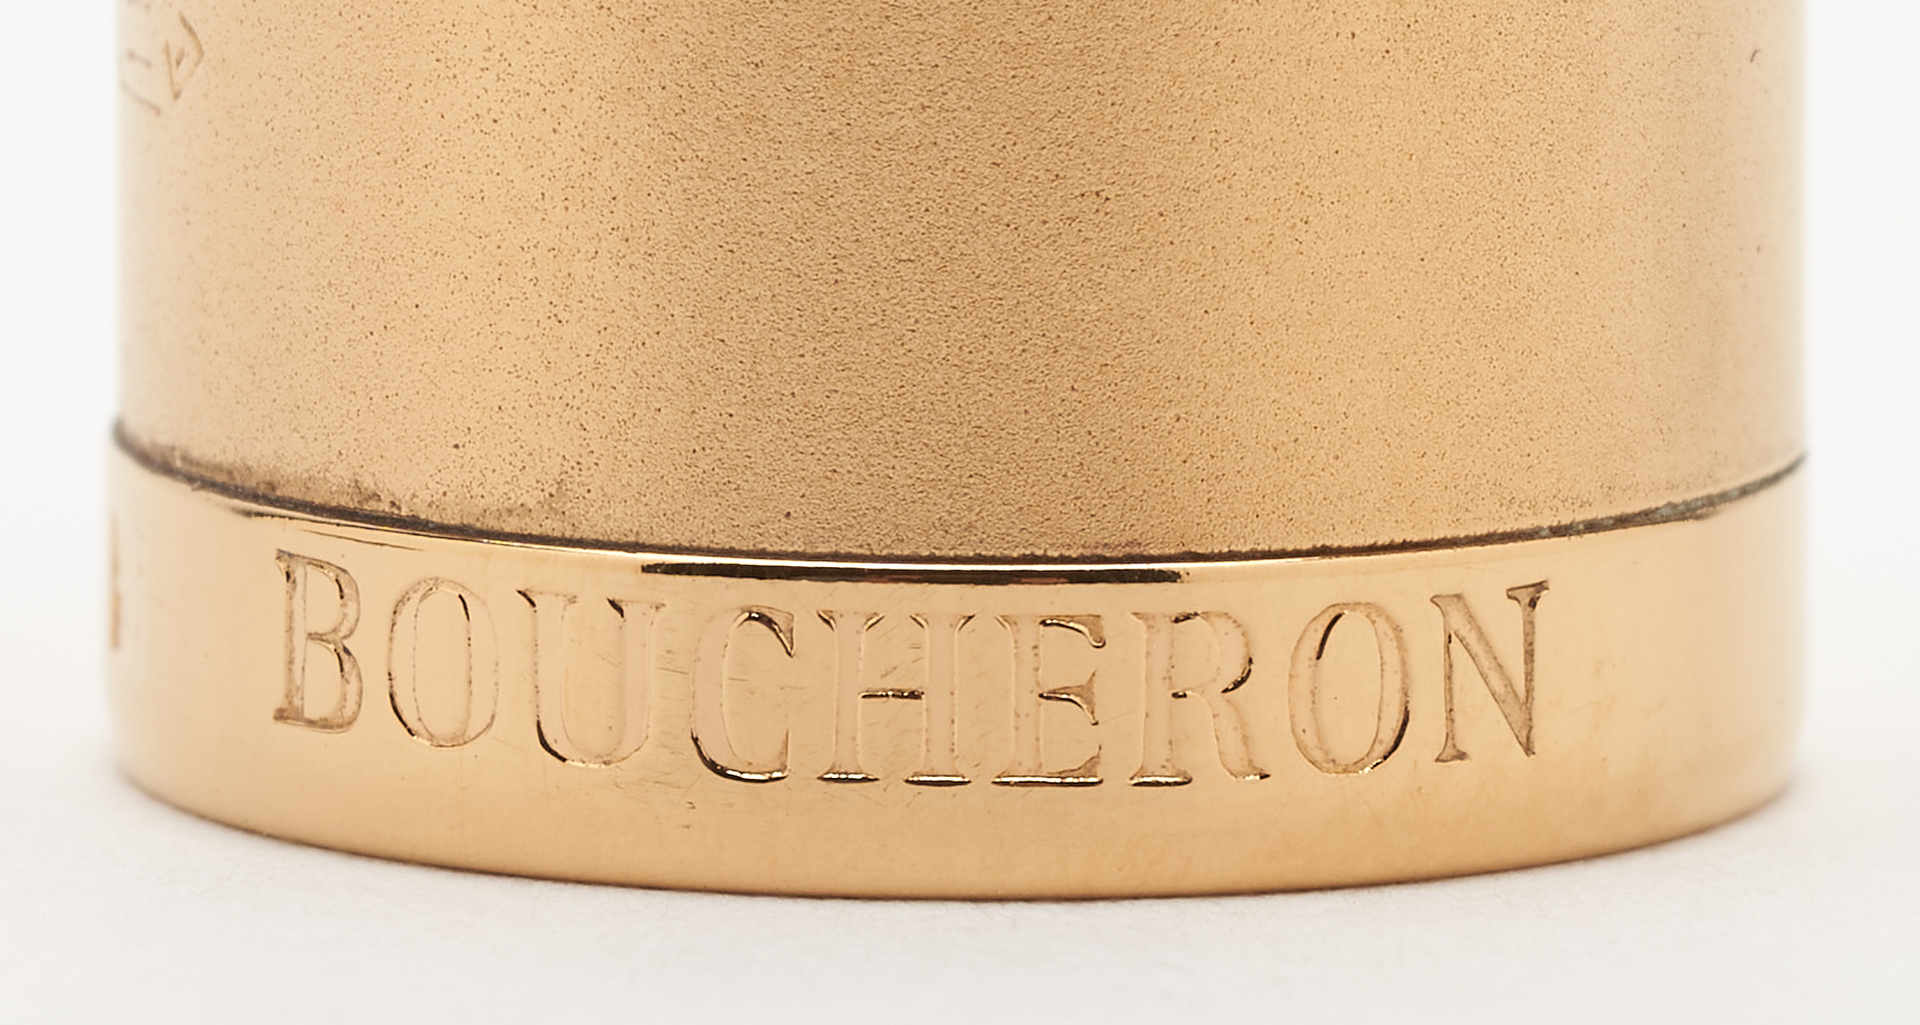 Lot 69: Waterman Boucheron Signed Edson Fountain Pen